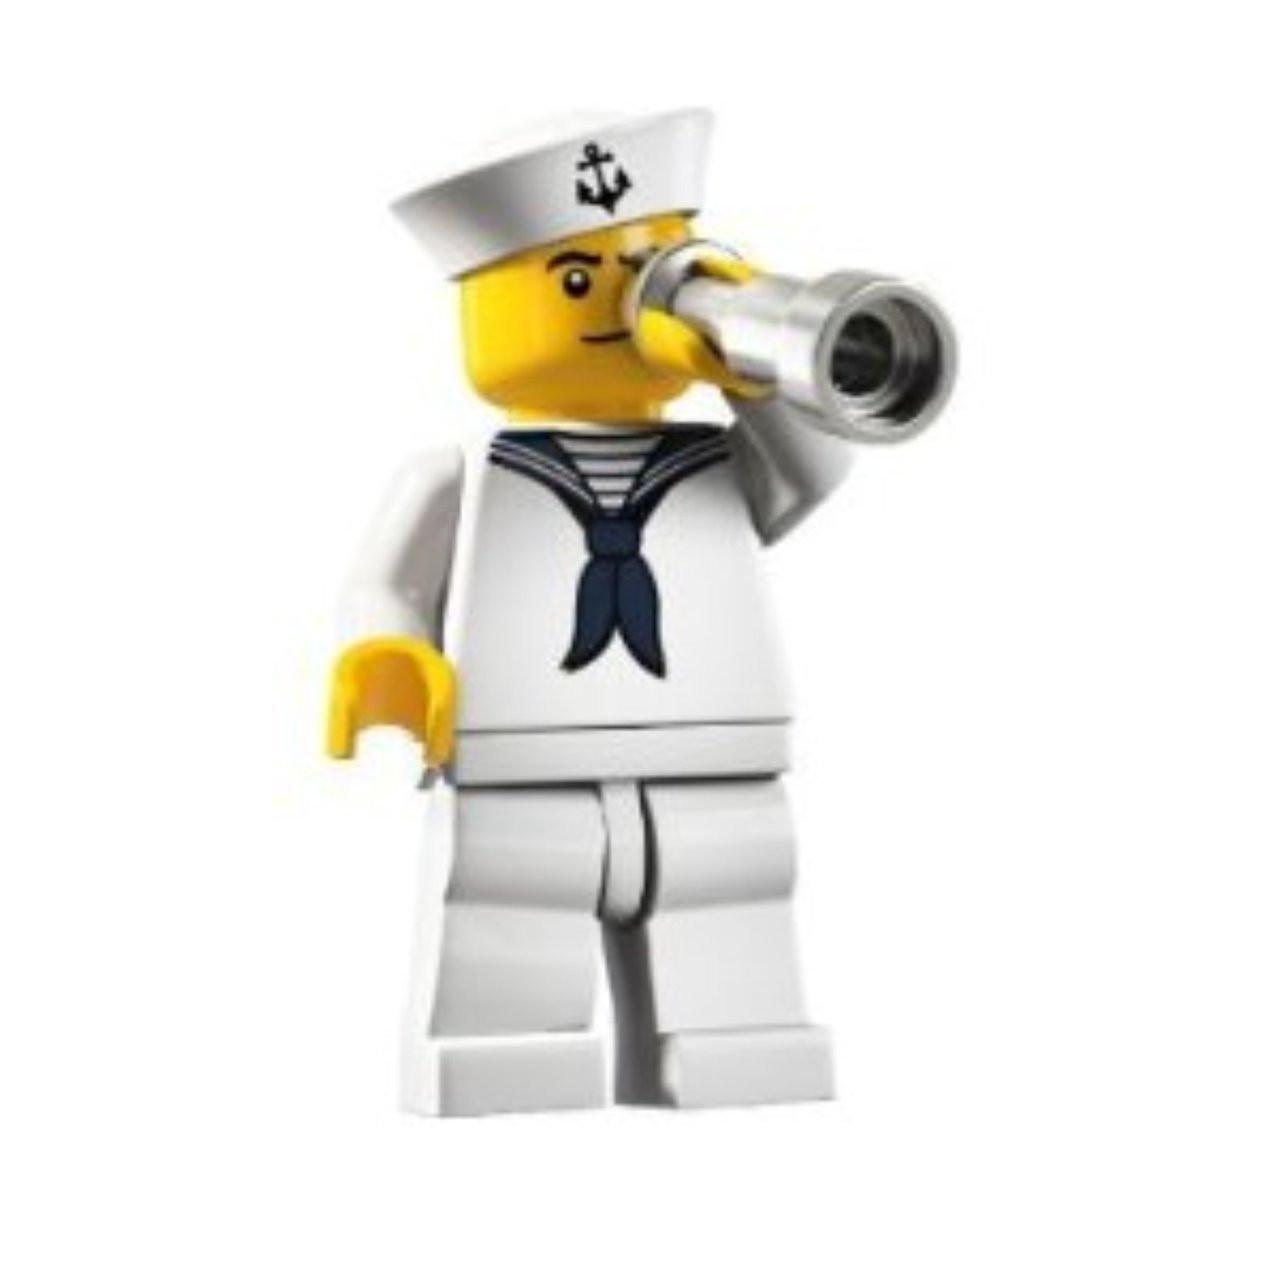 Lego 8804 Minifigure Series 4 Sailor Complete